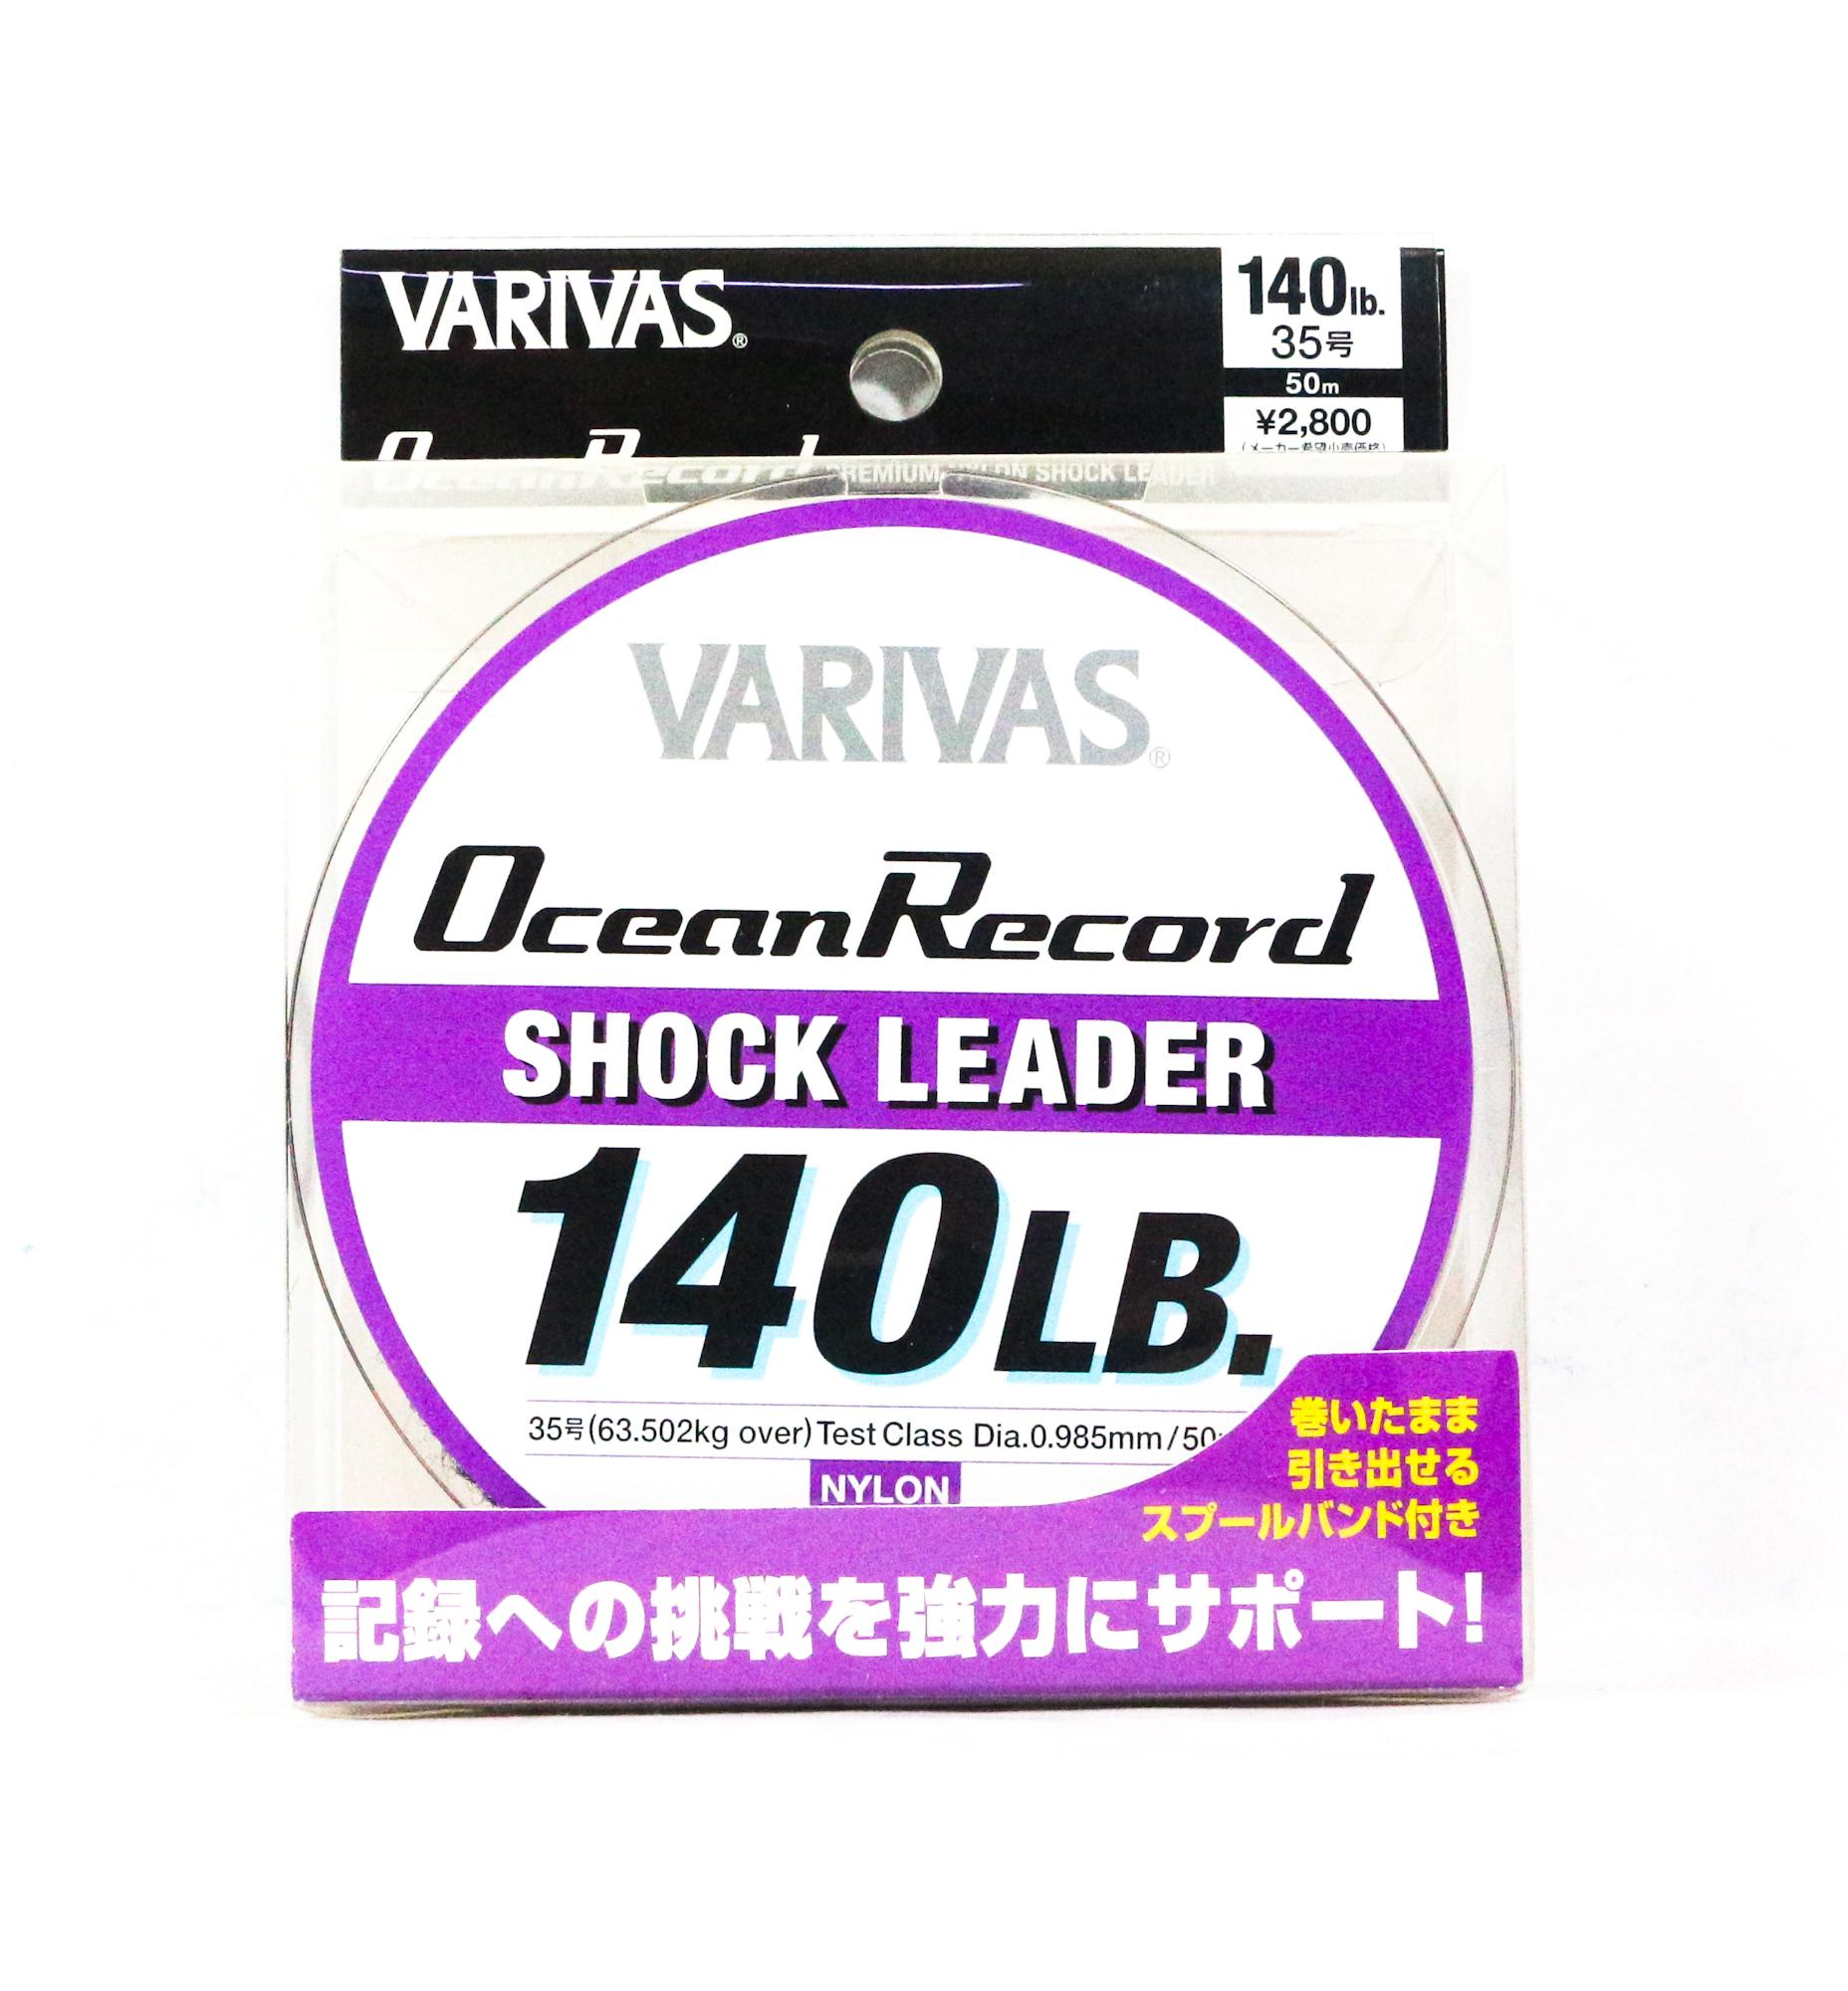 Varivas Nylon Ocean Record Shock Leader Line 50m 140lb (9969)